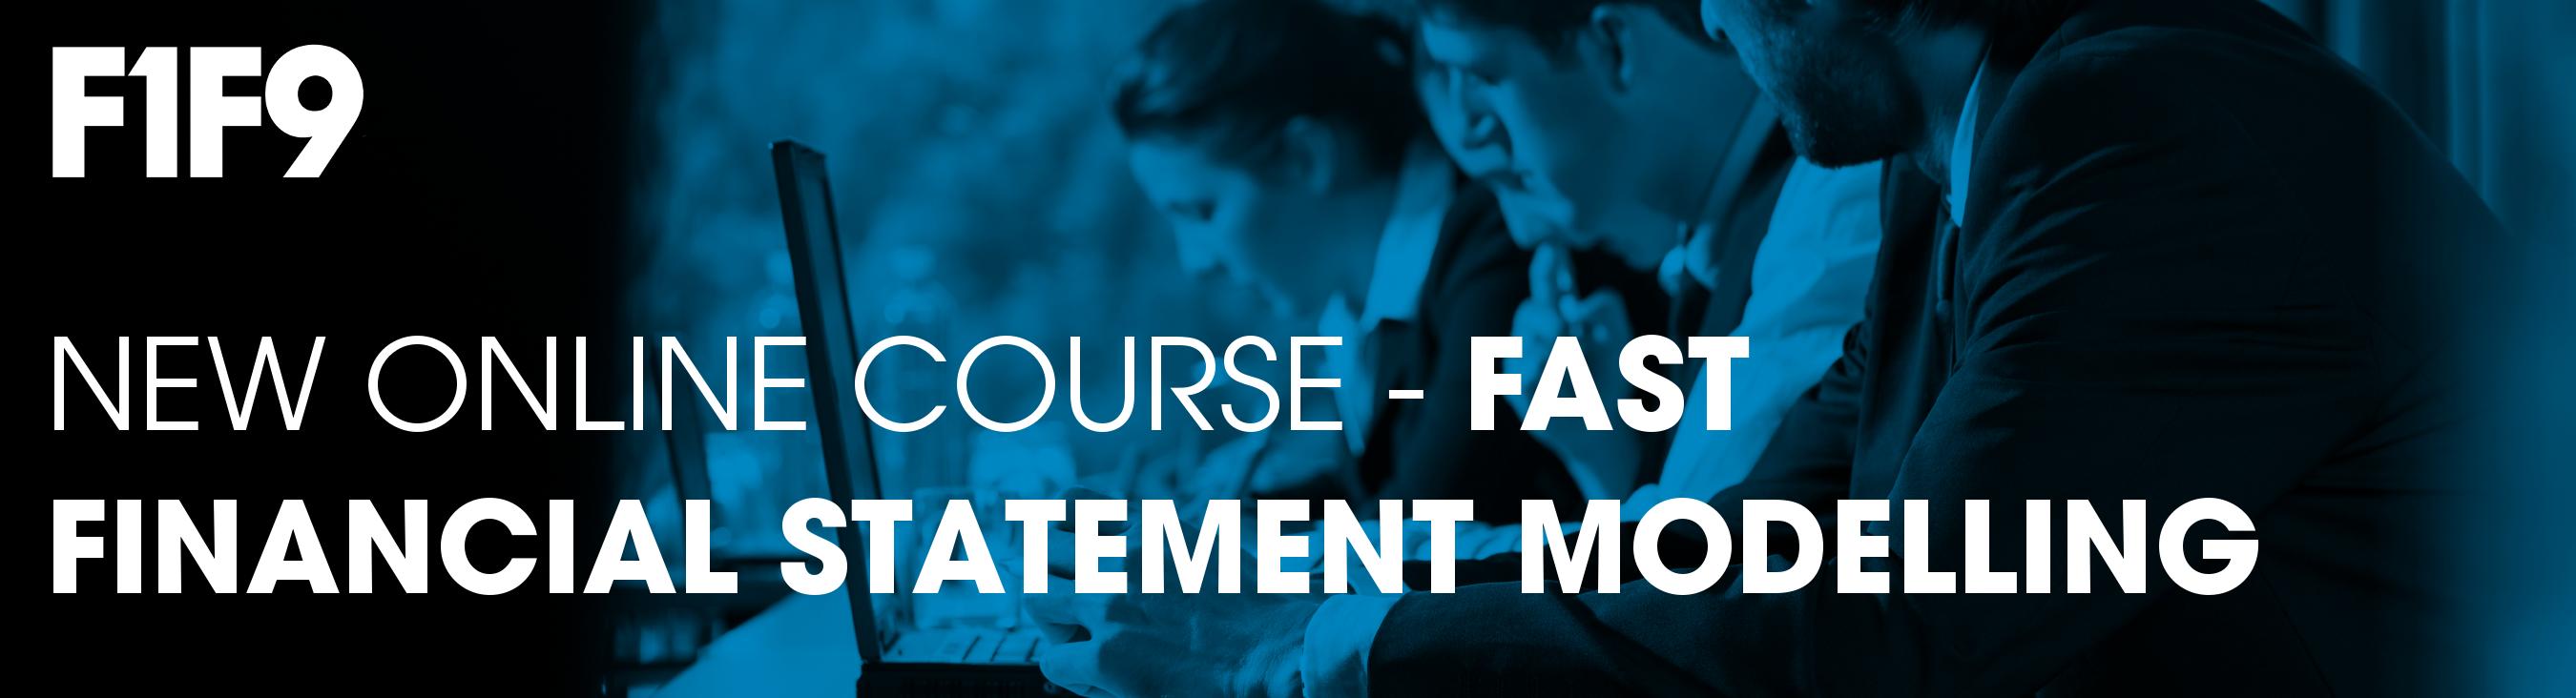 FAST Financial Statement Modelling online